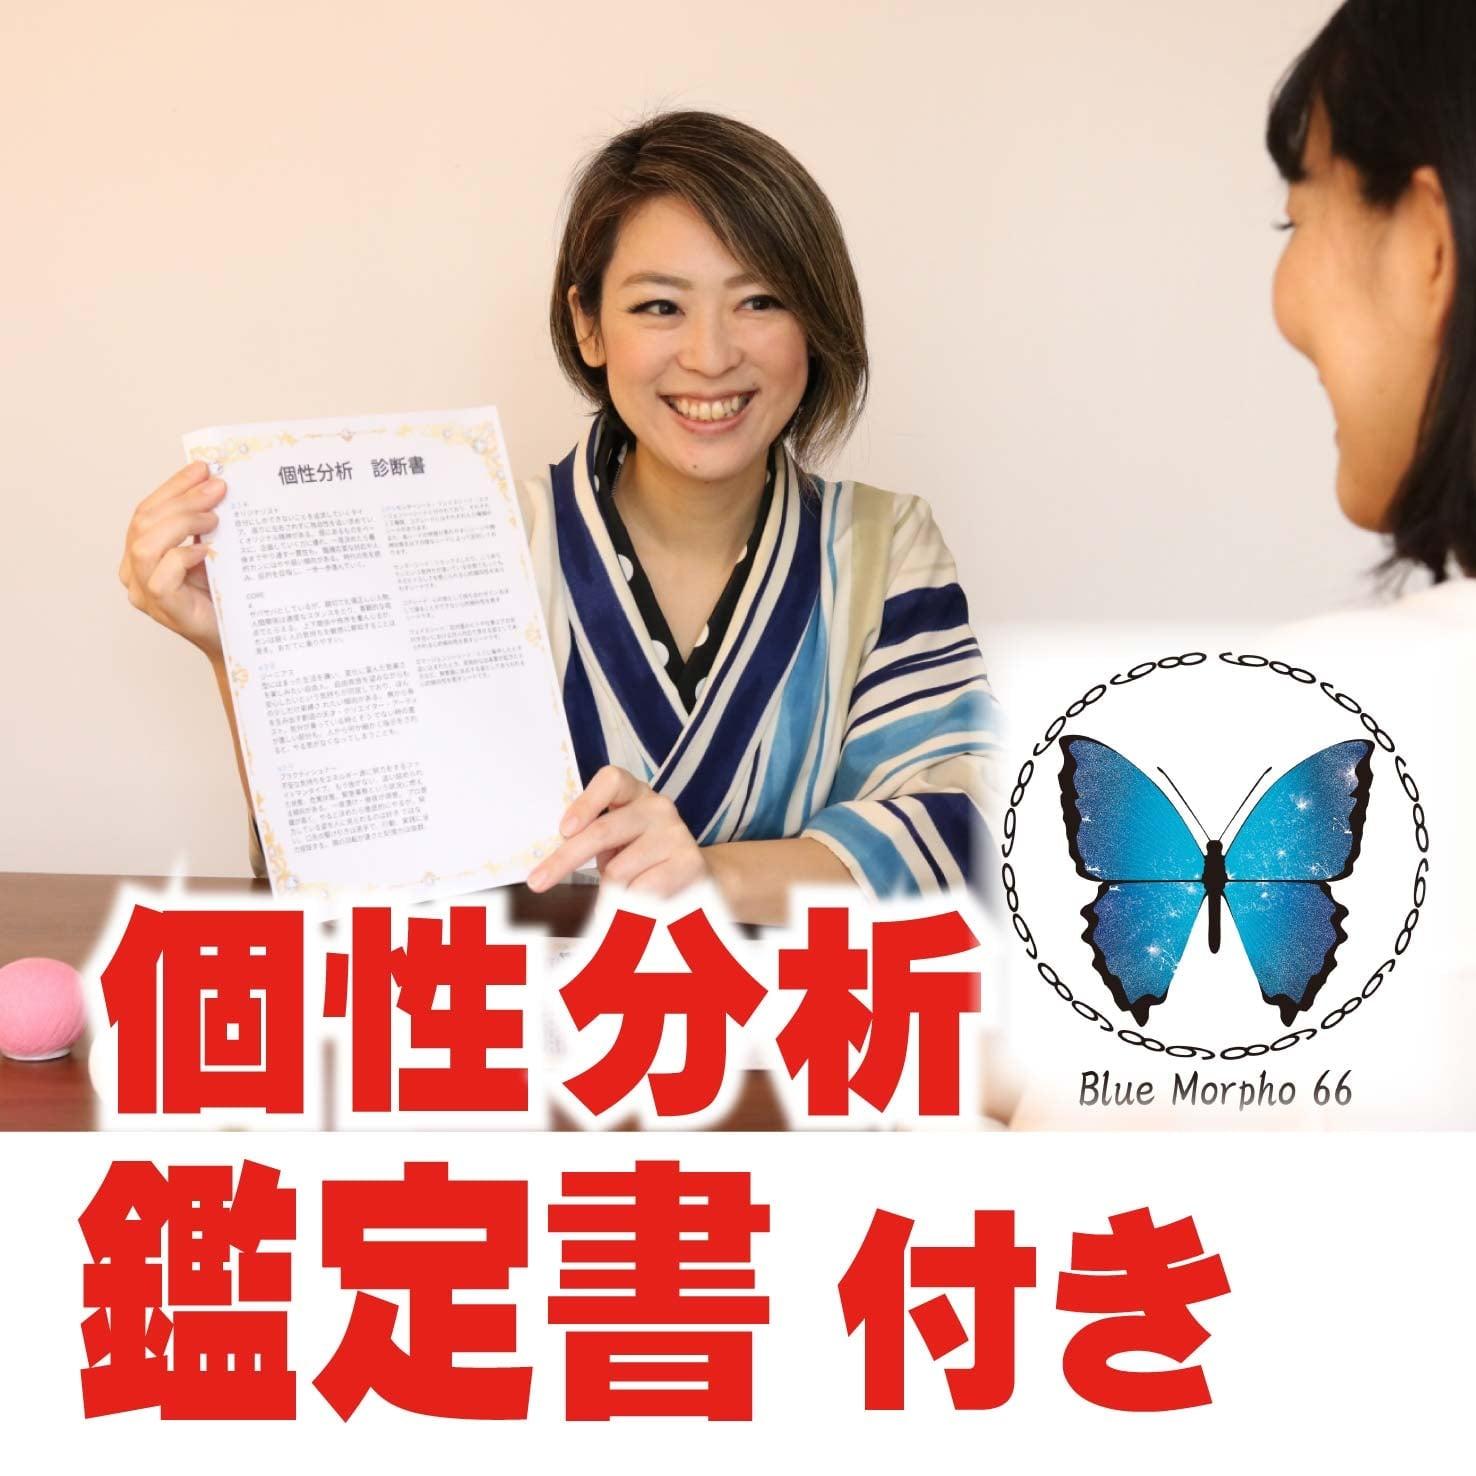 HSP【初回】【9割がリピート】ポジティブ・ファウンテン・カウンセリング&コーチングのイメージその3